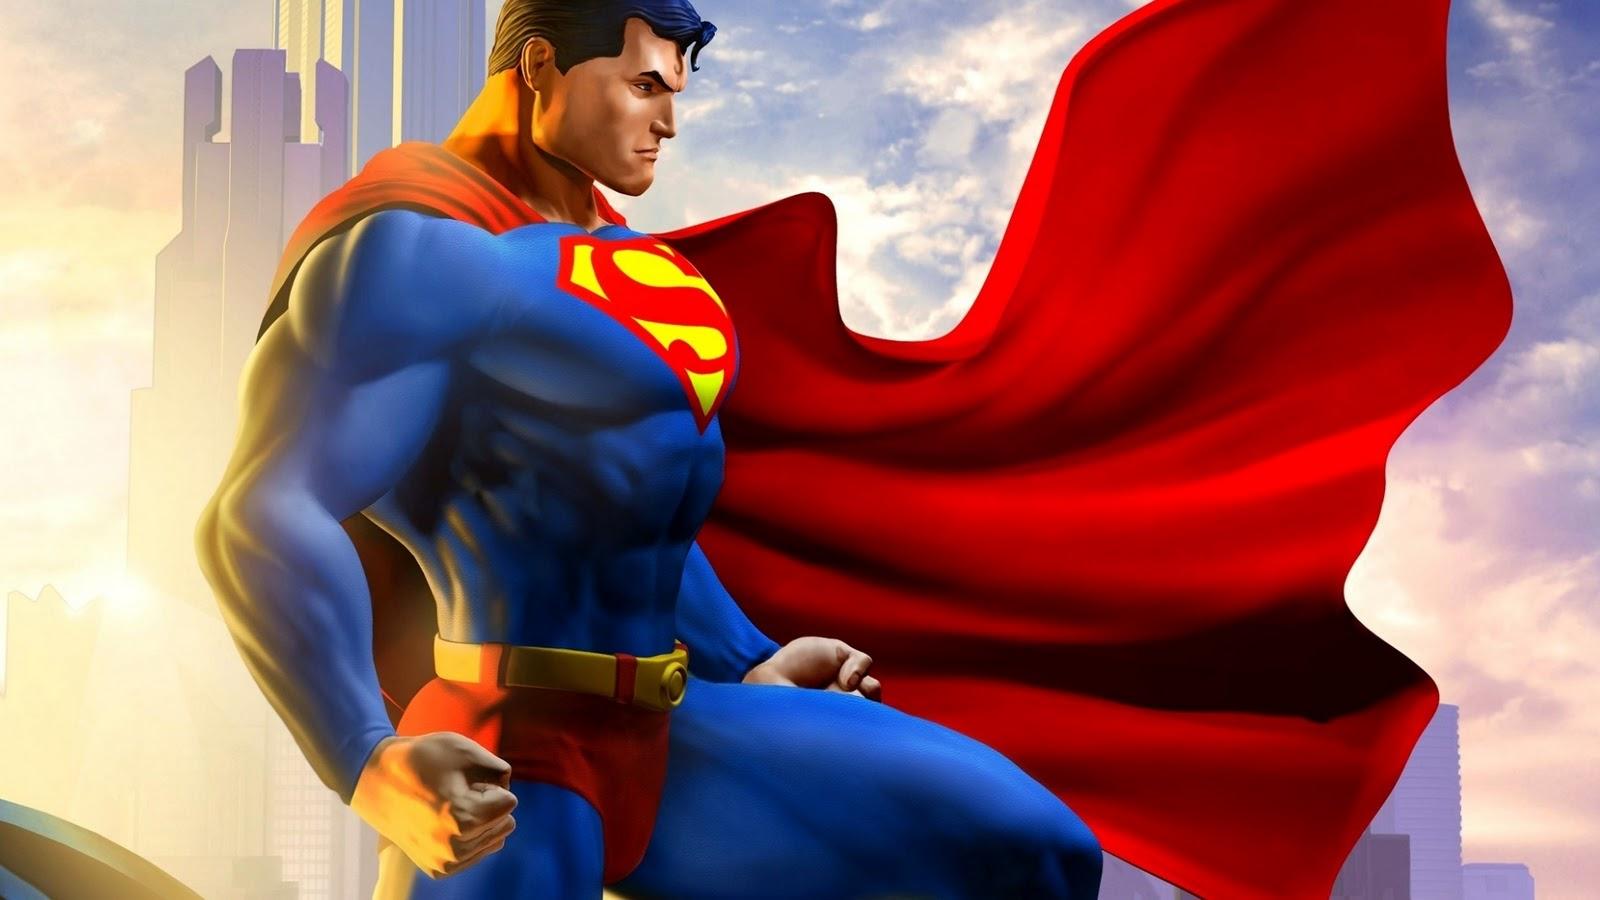 superman wallpaper hd | waka 2